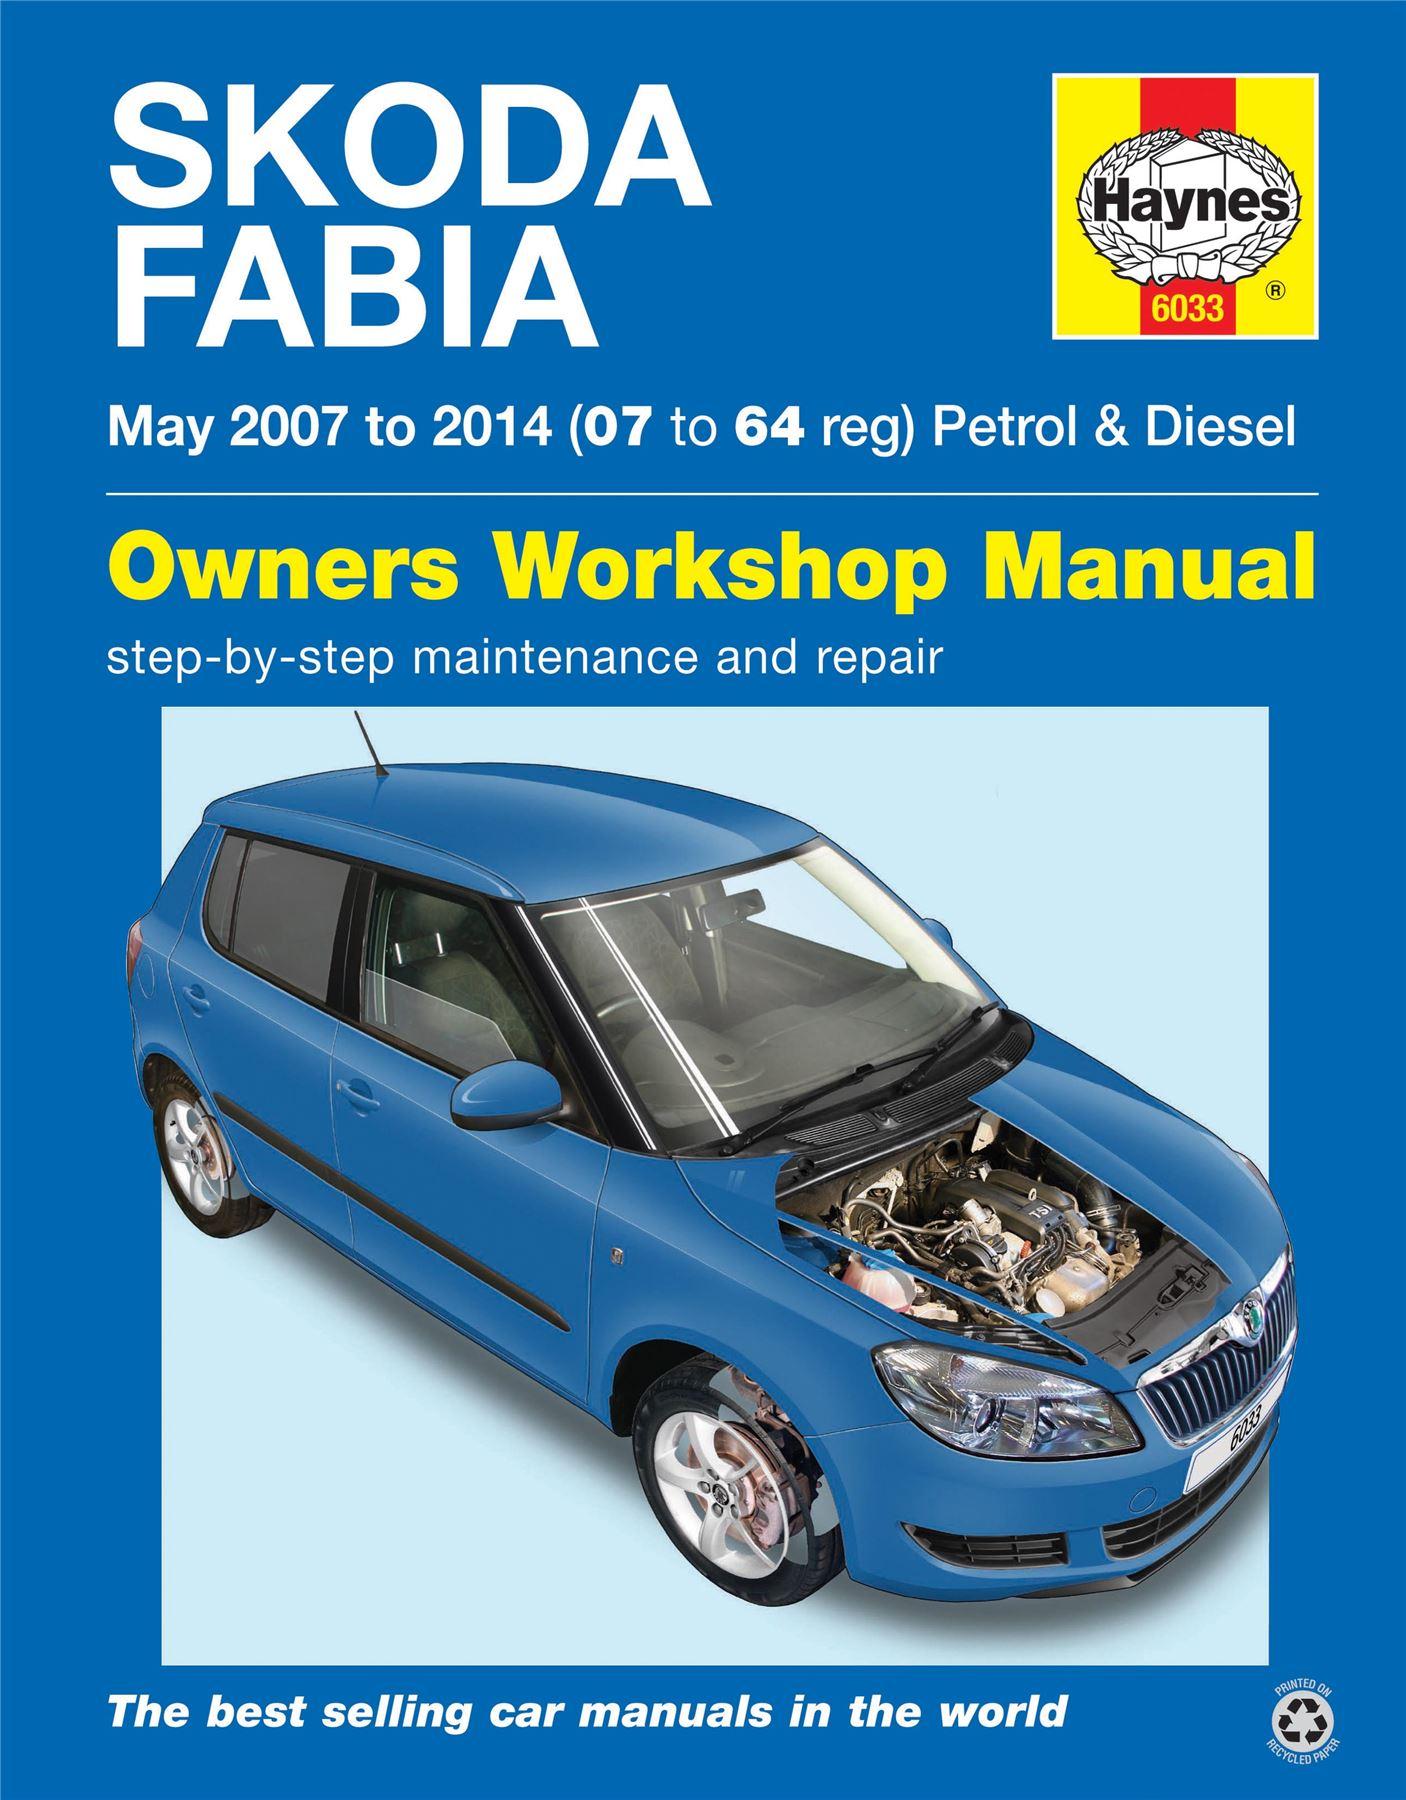 haynes skoda fabia petrol diesel may 2007 2014 07 to 64 service rh ebay co uk haynes skoda felicia service and repair manual pdf Skoda Favorit